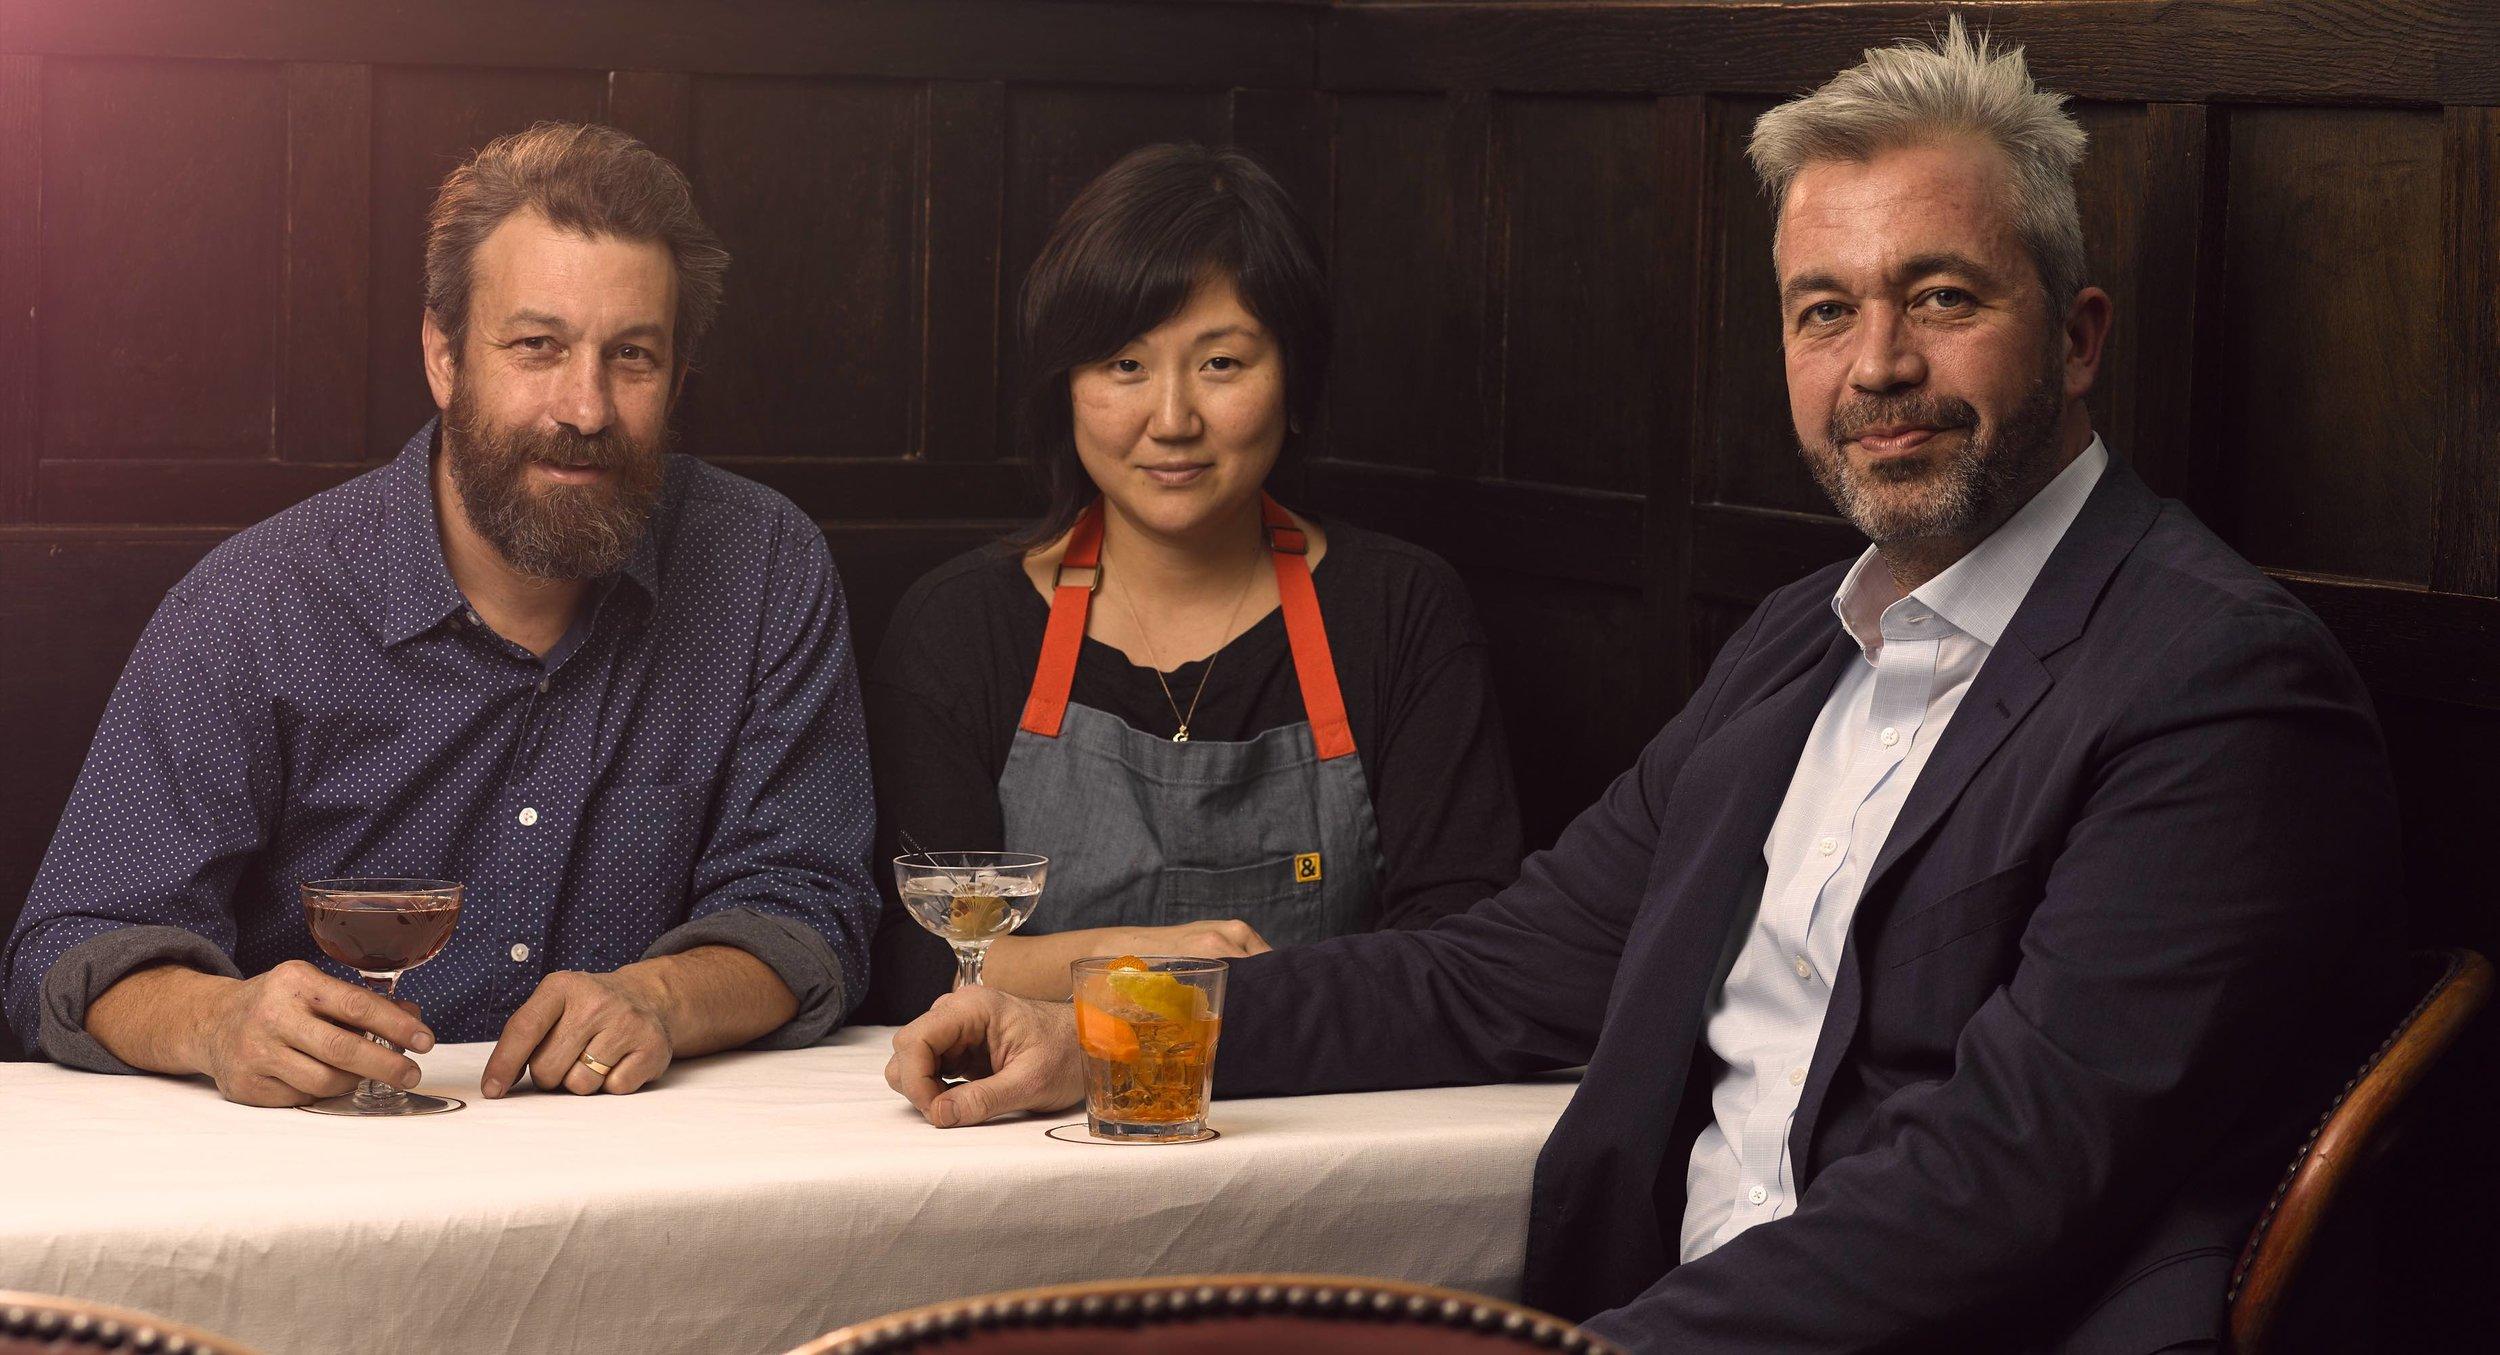 Ben Schneider, Sohui Kim, and St. John Frizell